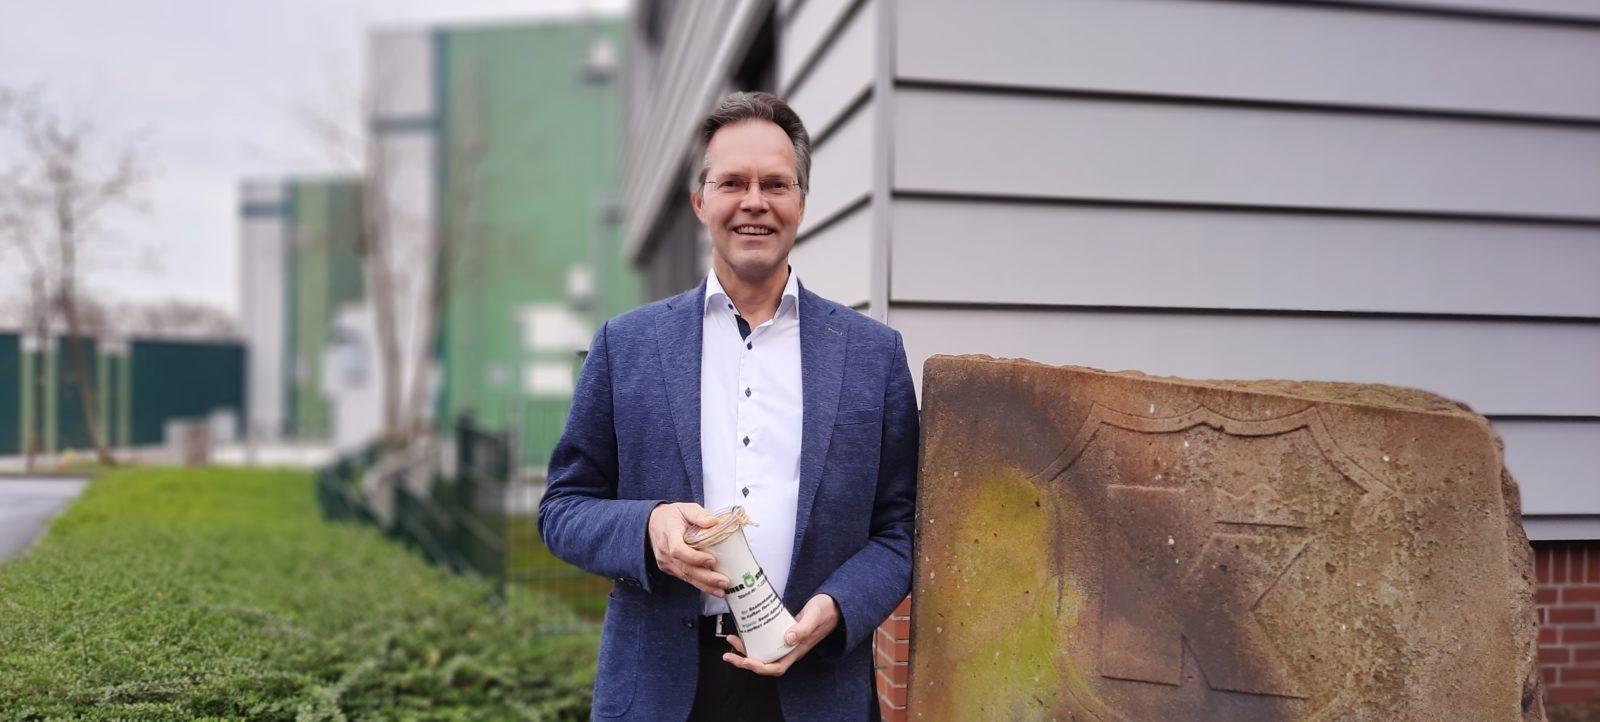 KRÖNER-STÄRKE makes clean-label convenience a reality